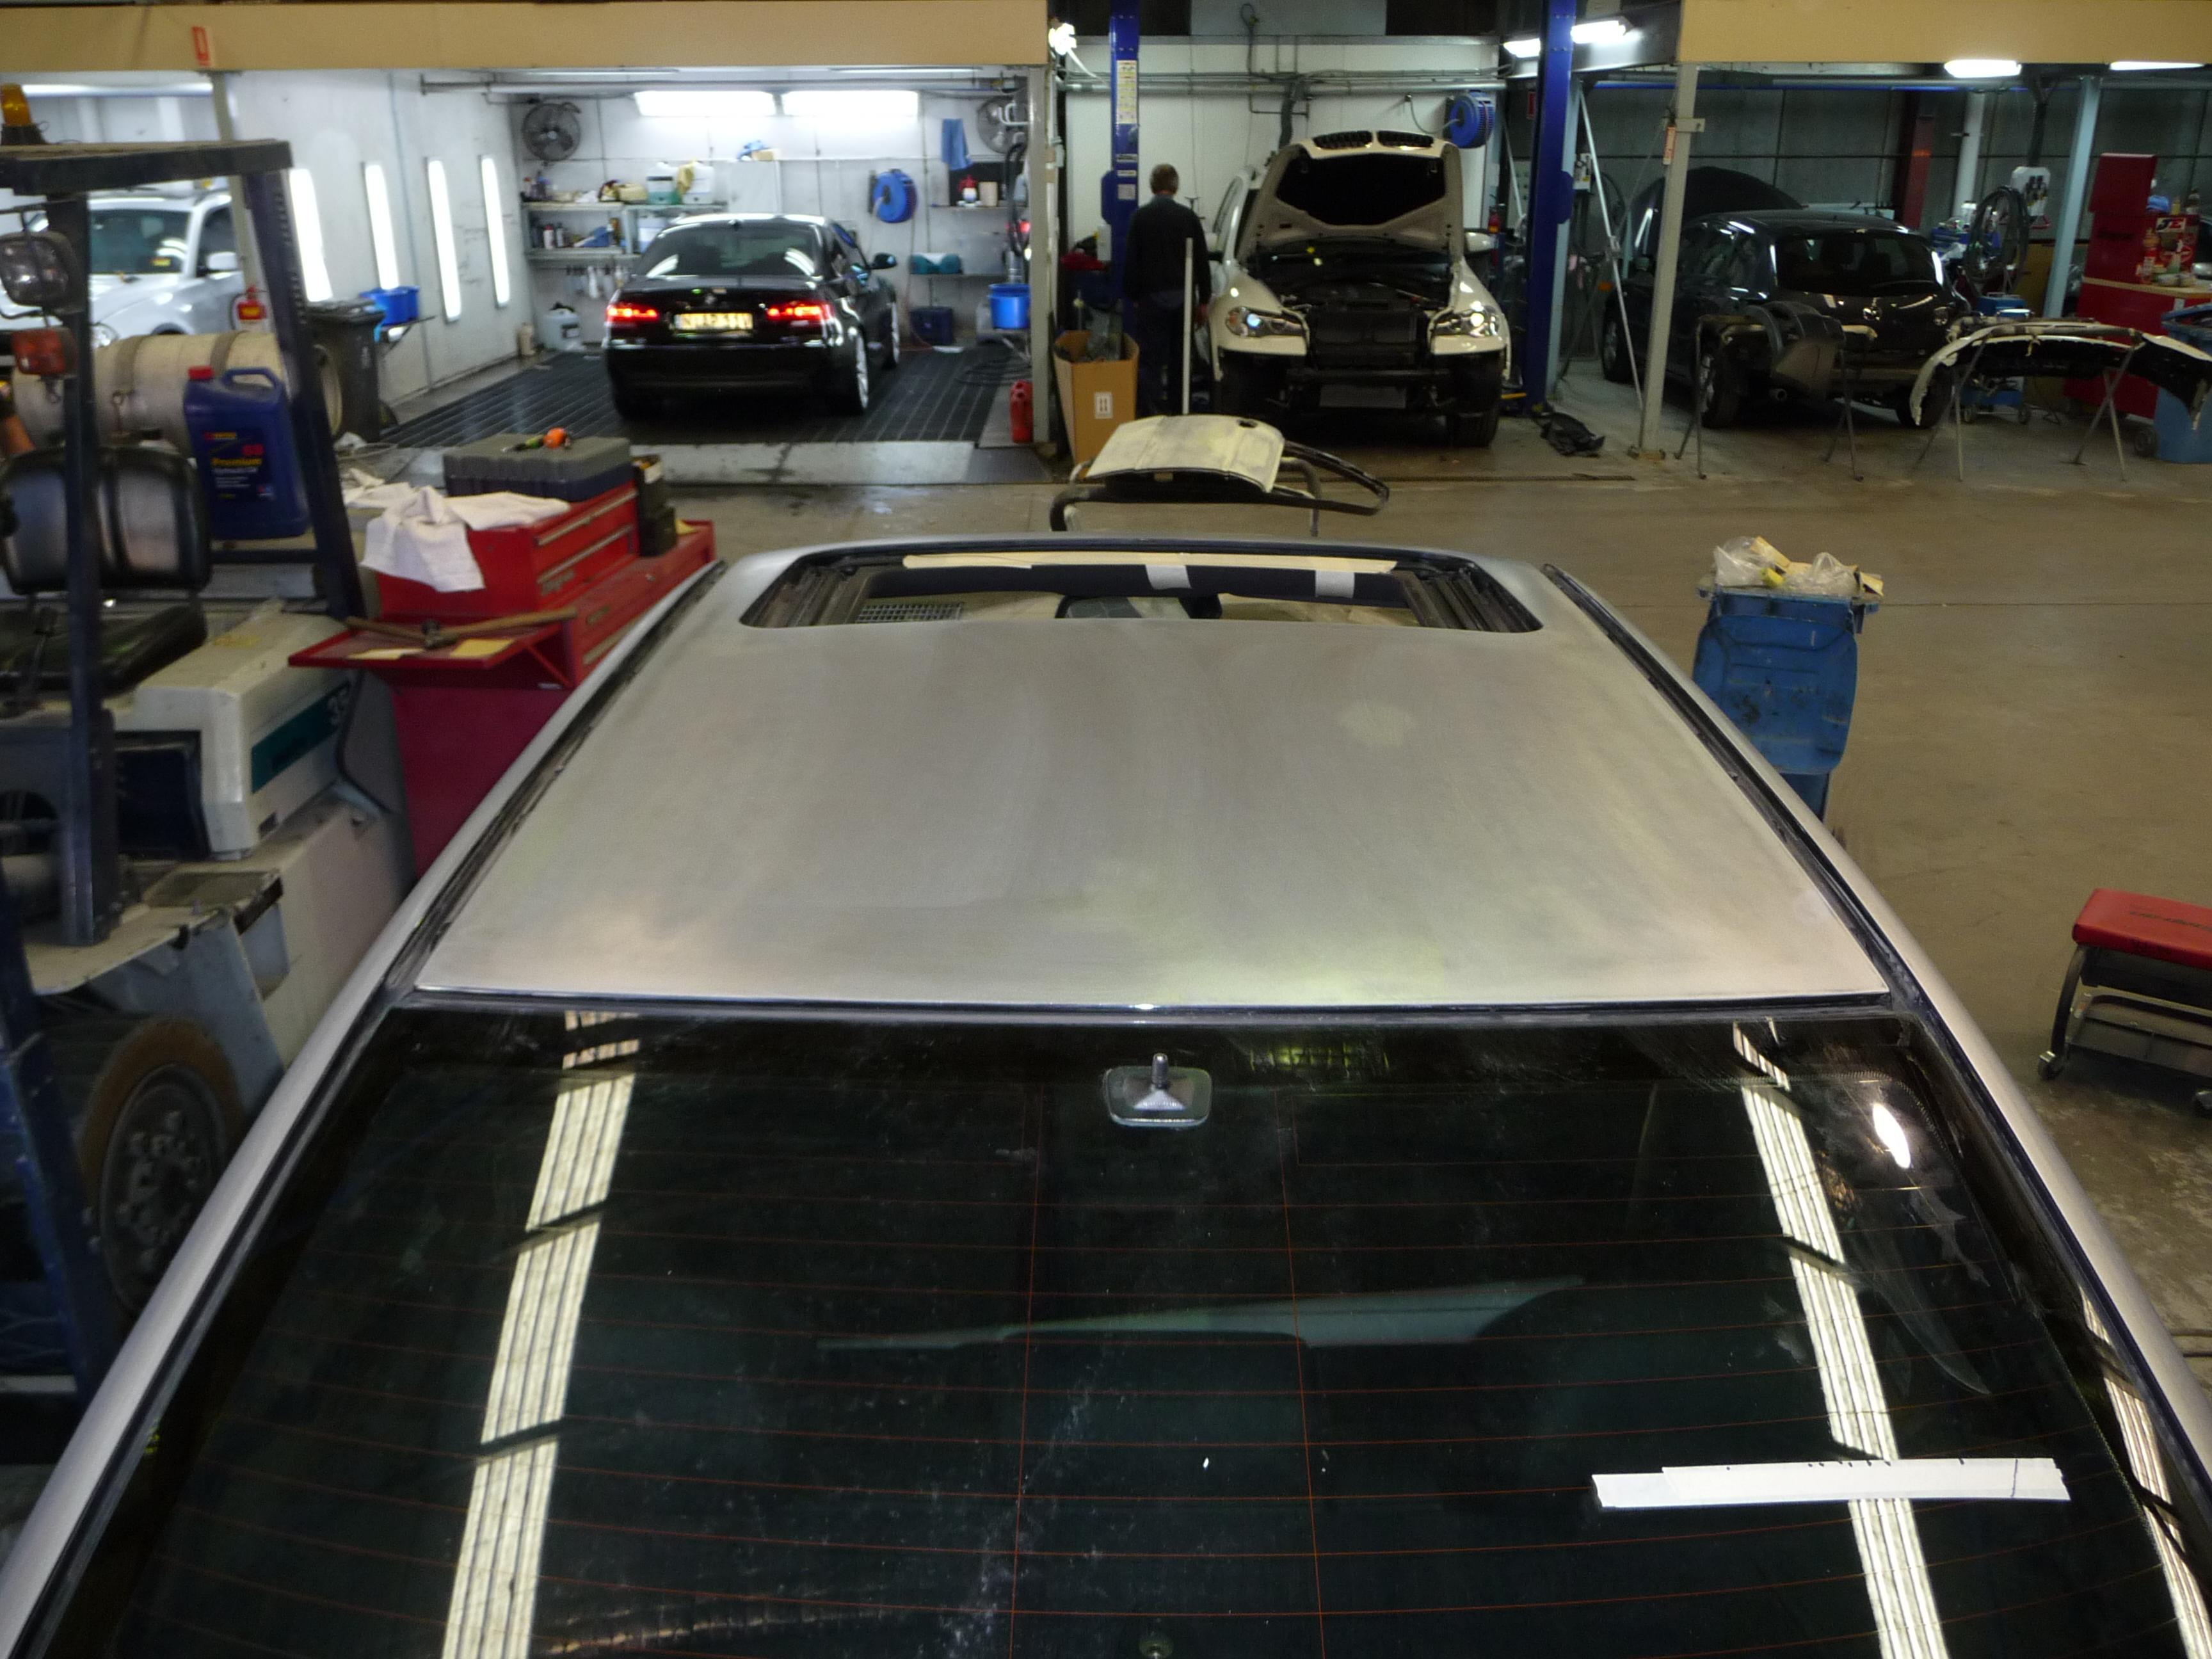 My Carbon Black bare metal respray - progress photos-m5-respray-007.jpg